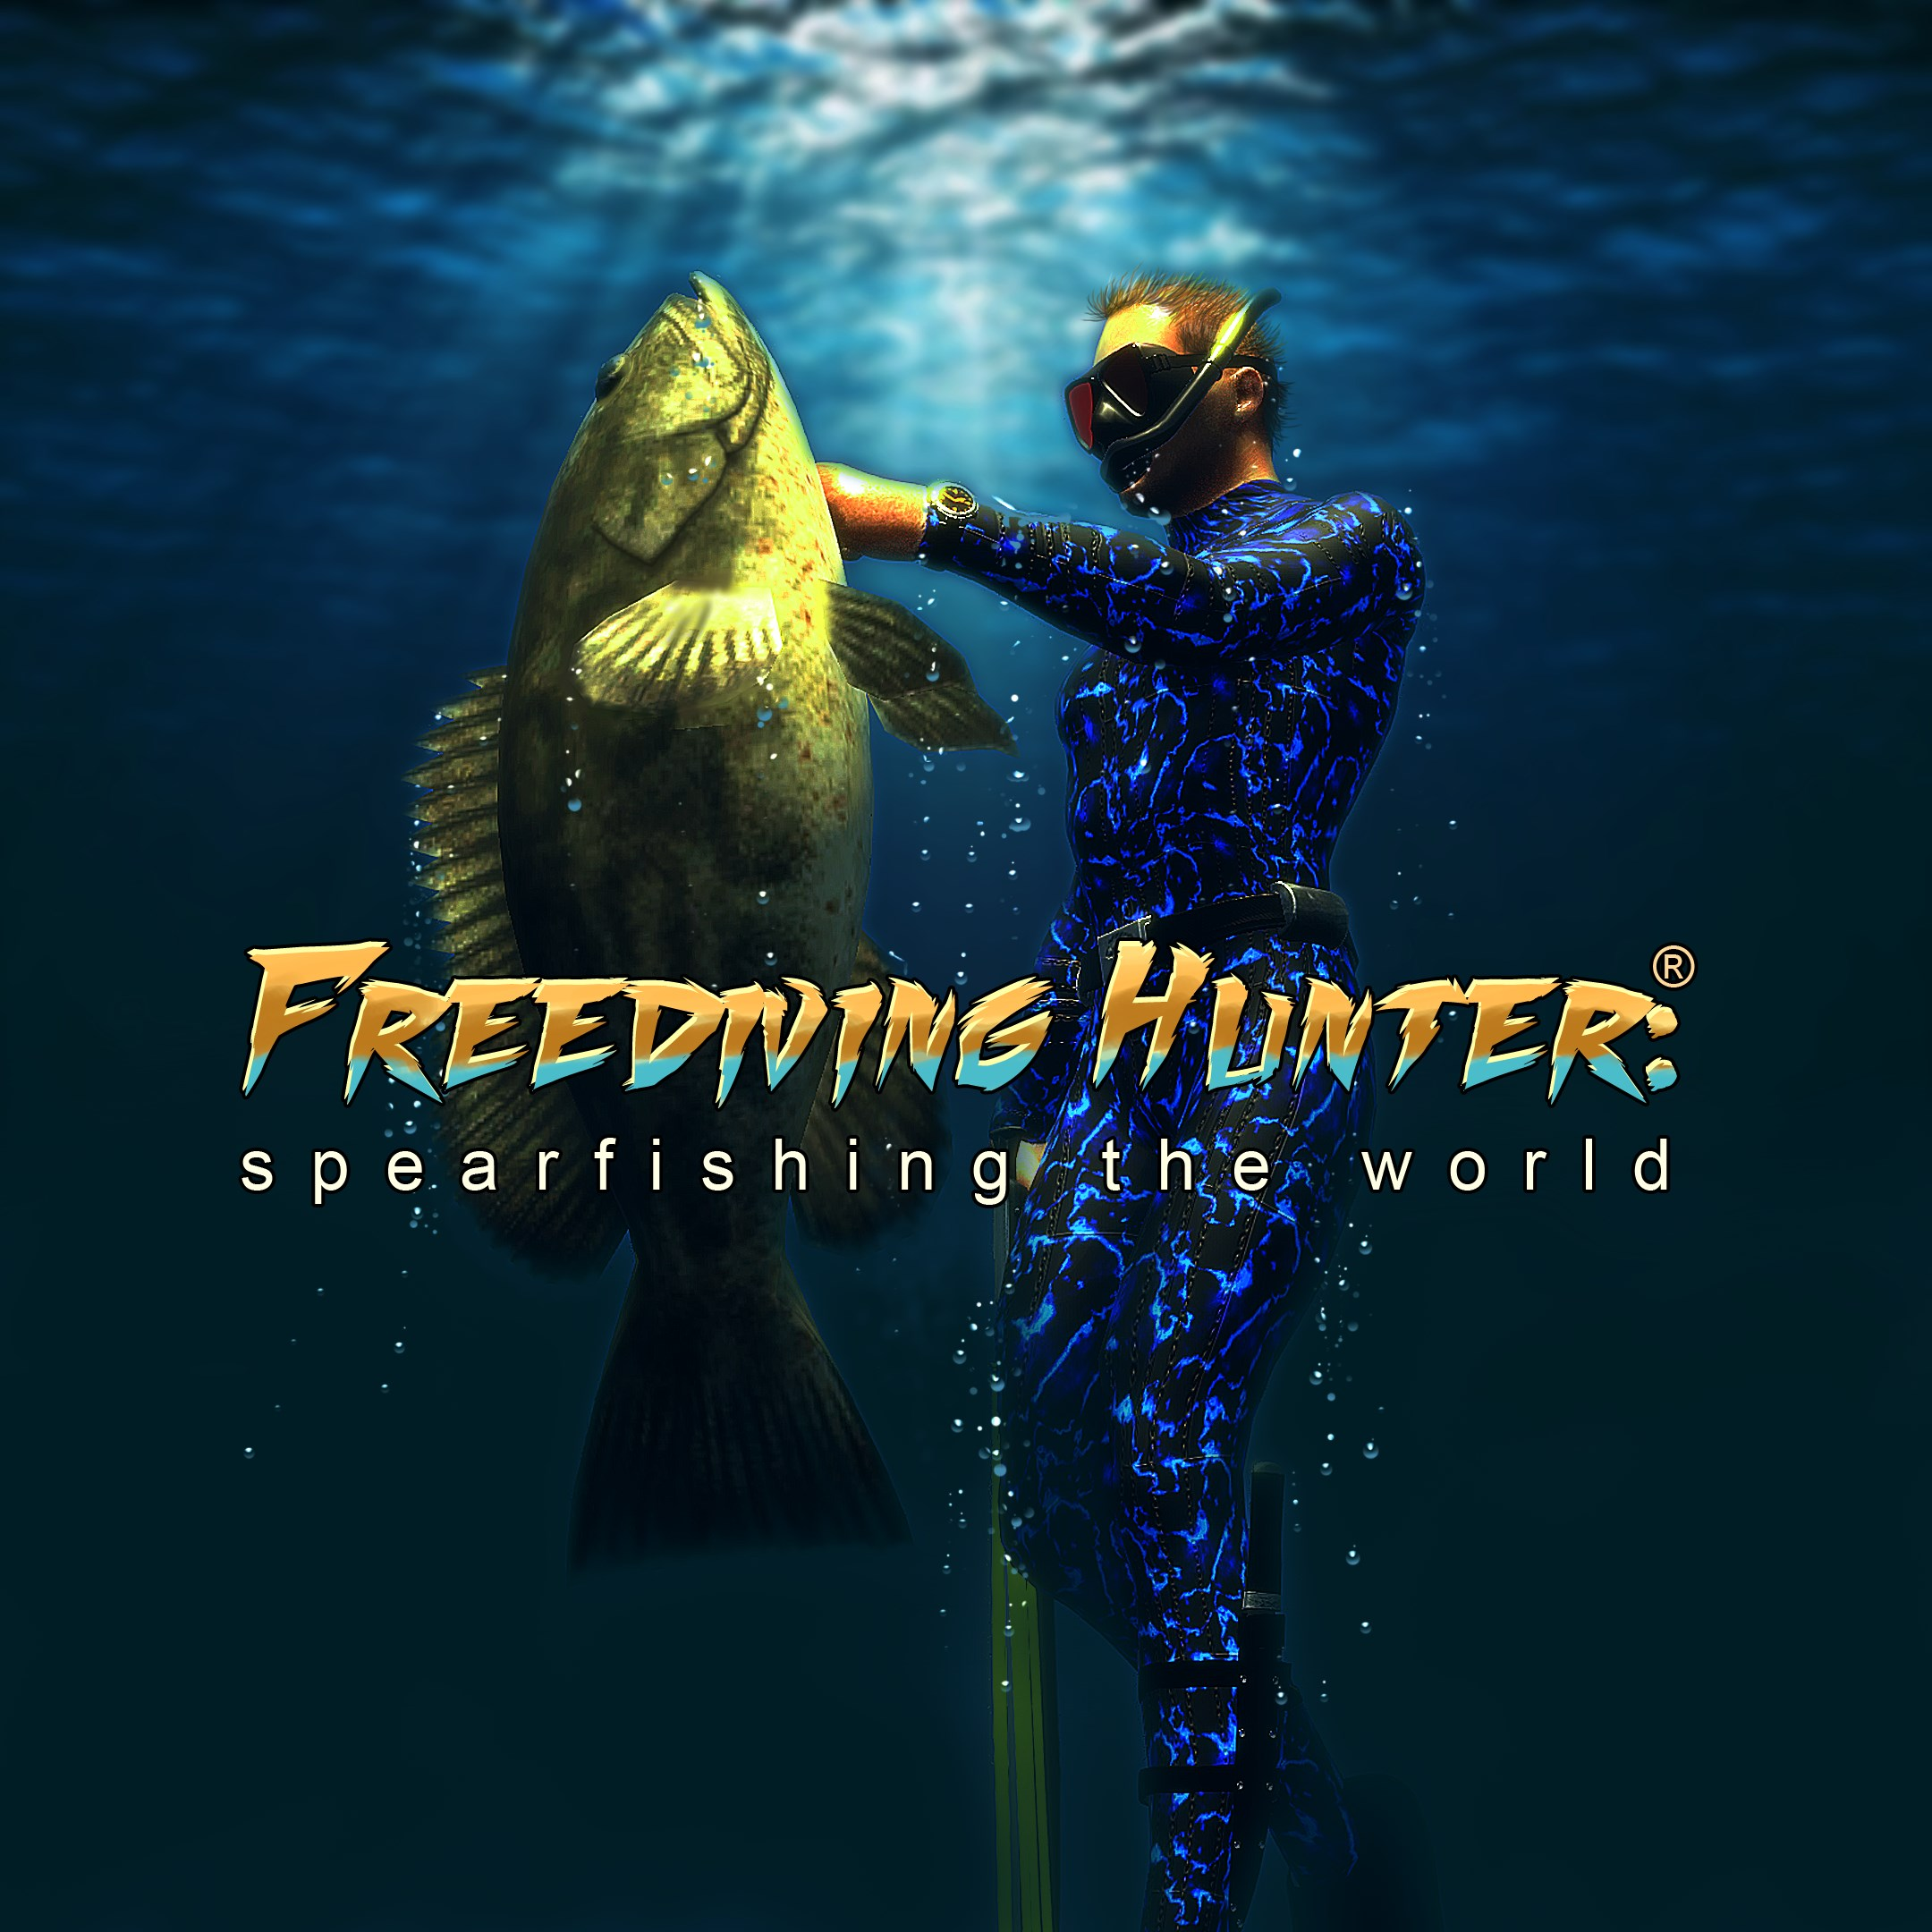 Freediving Hunter: Spearfishing the World achievements